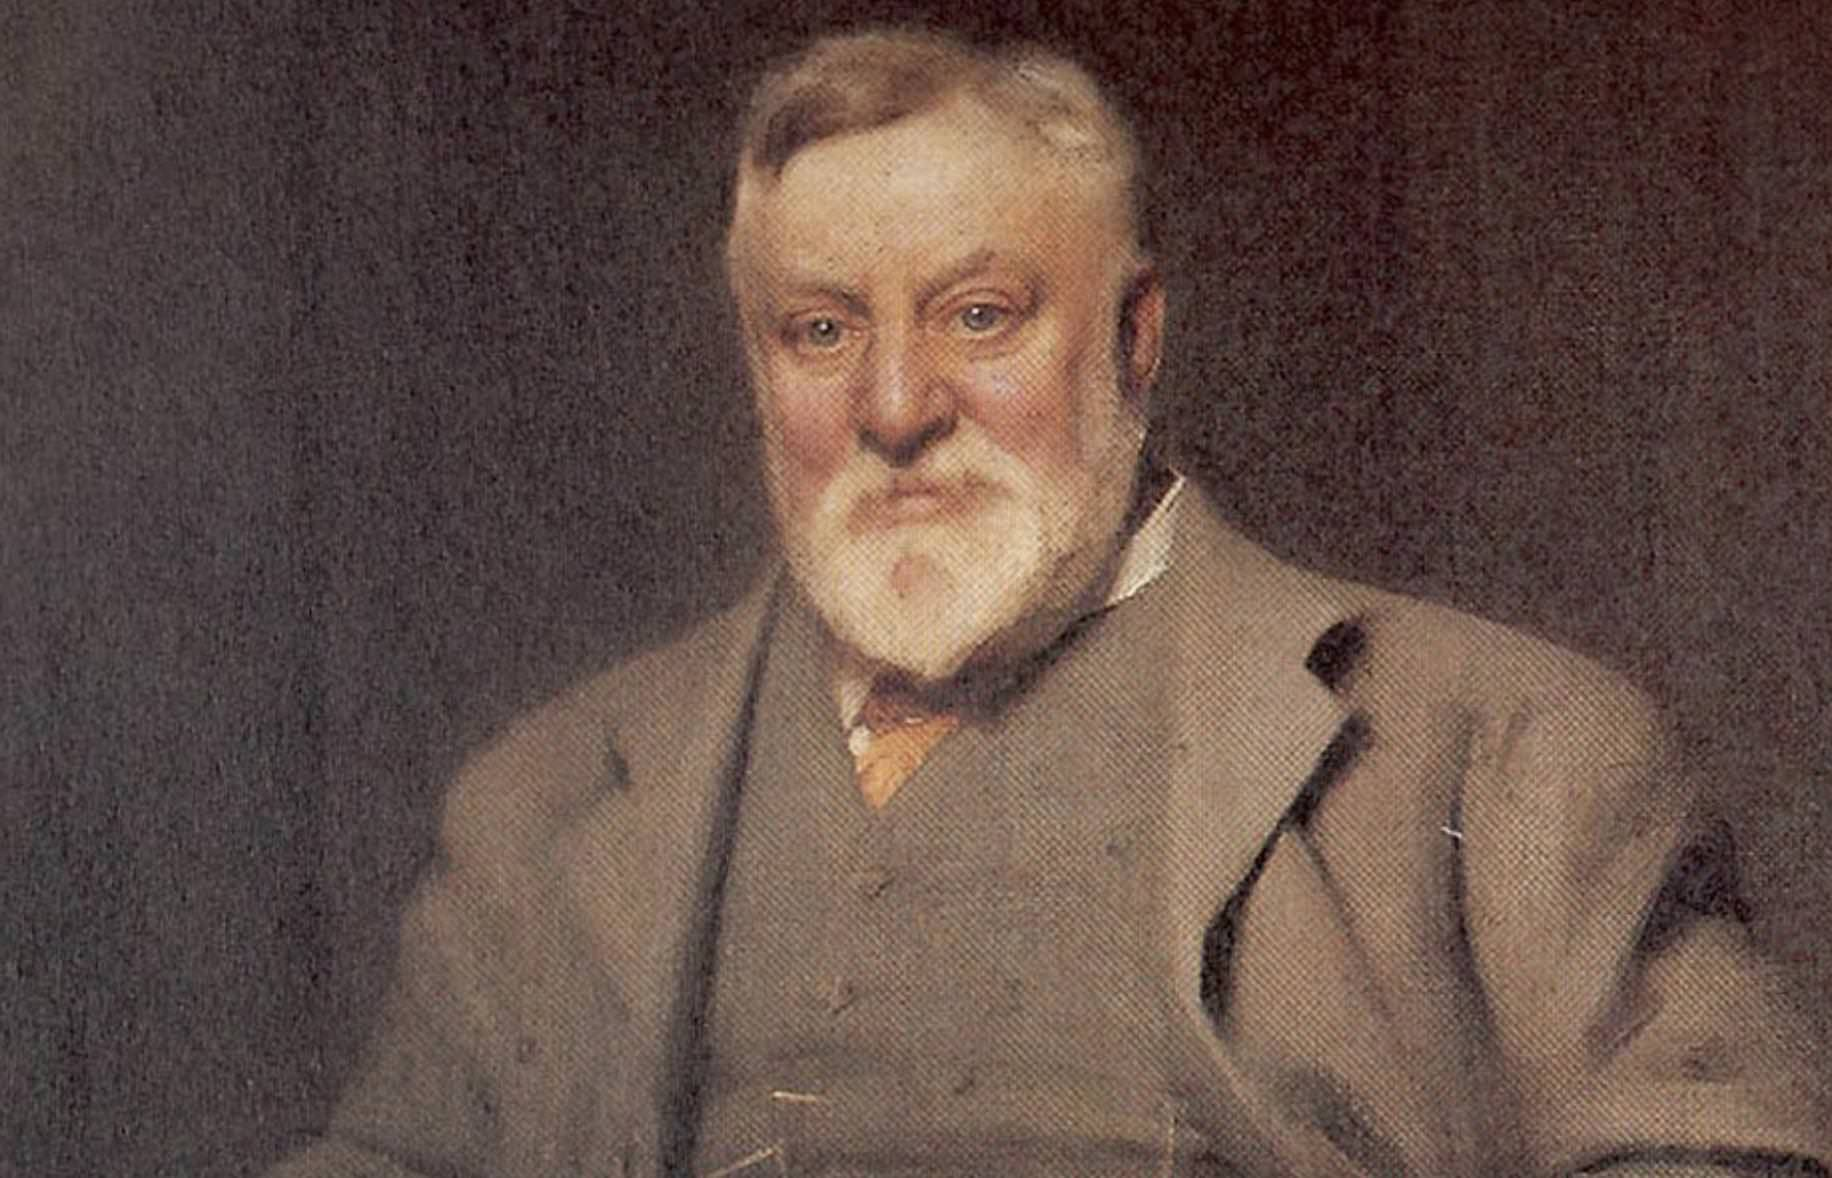 Артур Ласенби Либерти основатель Liberty London